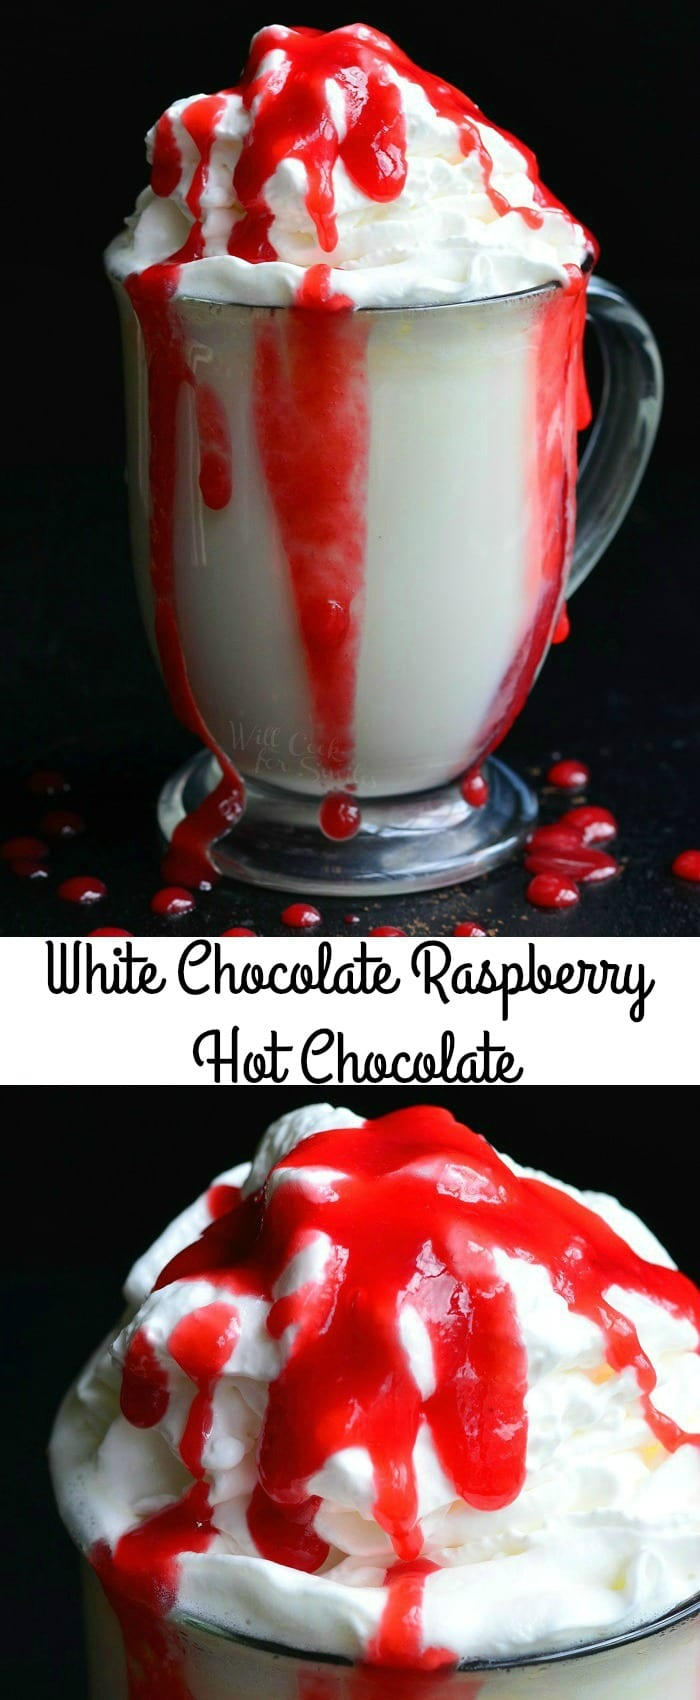 White Chocolate Raspberry Halloween Hot Chocolate | from willcookforsmiles.com #drink #chocolate #hotdrink